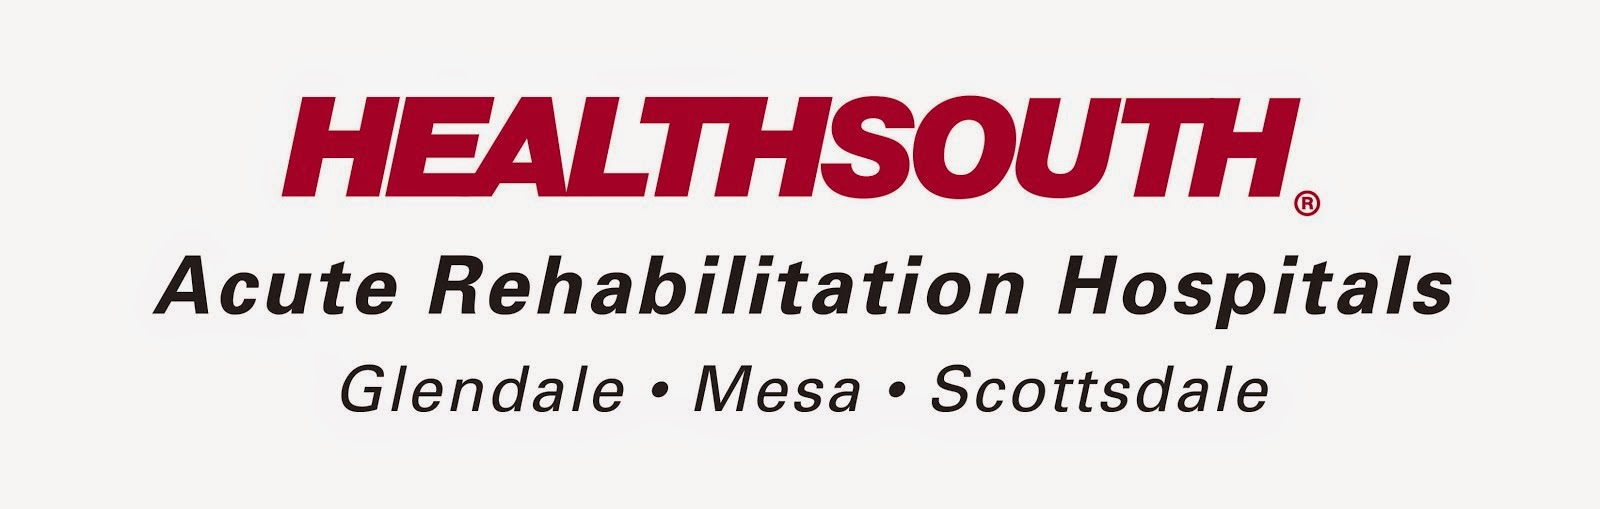 HealthSouth Acute Rehabilitation Hospitals